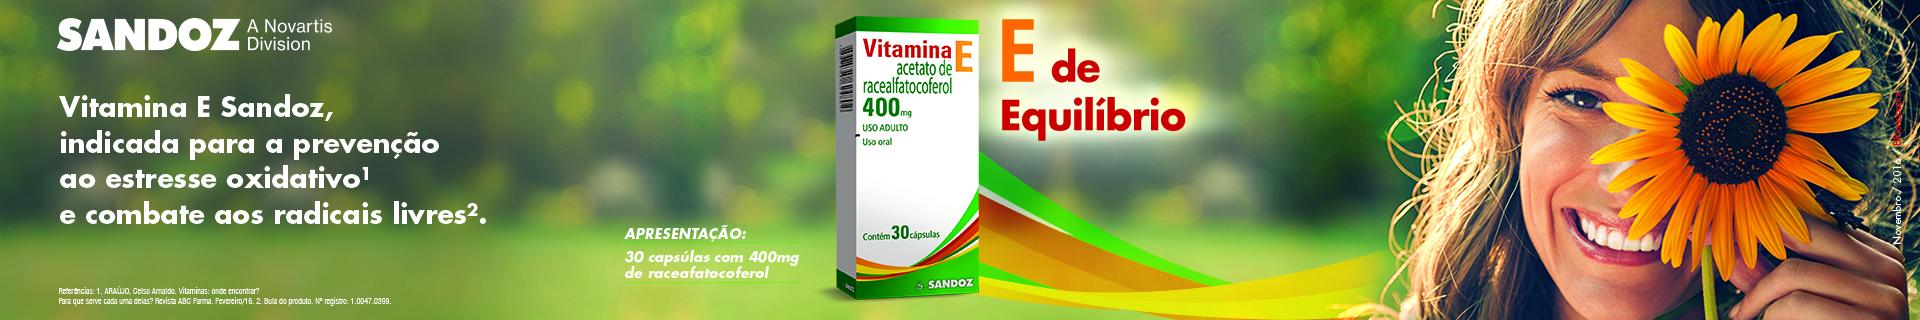 Ecd0c0c919cb298a225780dc2e9c6632826011b4vitamina e 4k consulta remedios